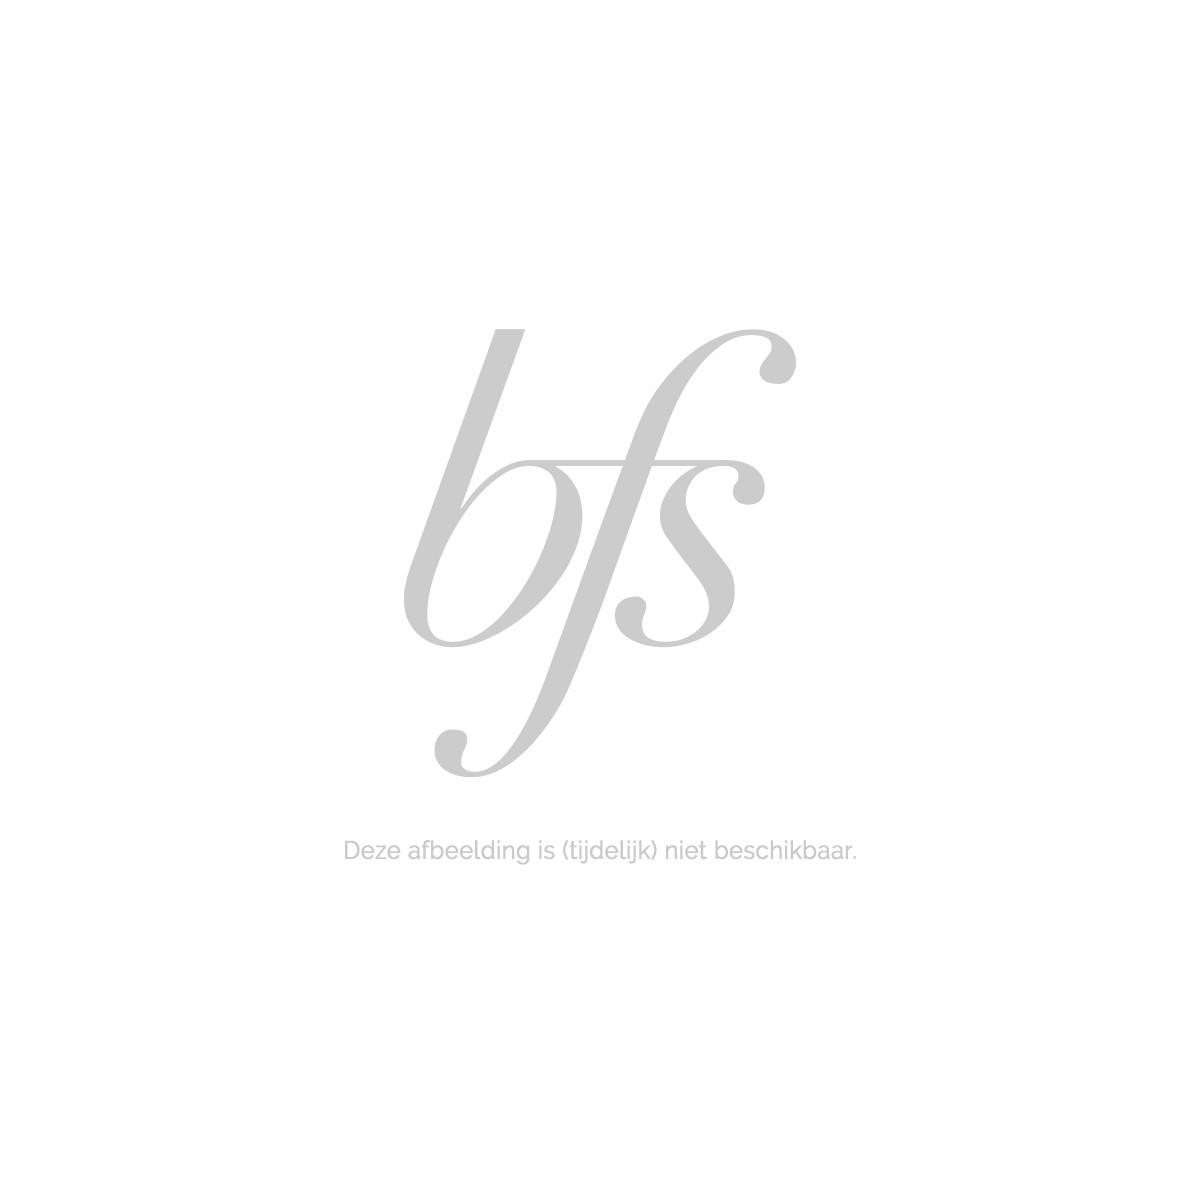 Christian Dior Capture Totale Dreamskin Advanced Serum 30 Ml